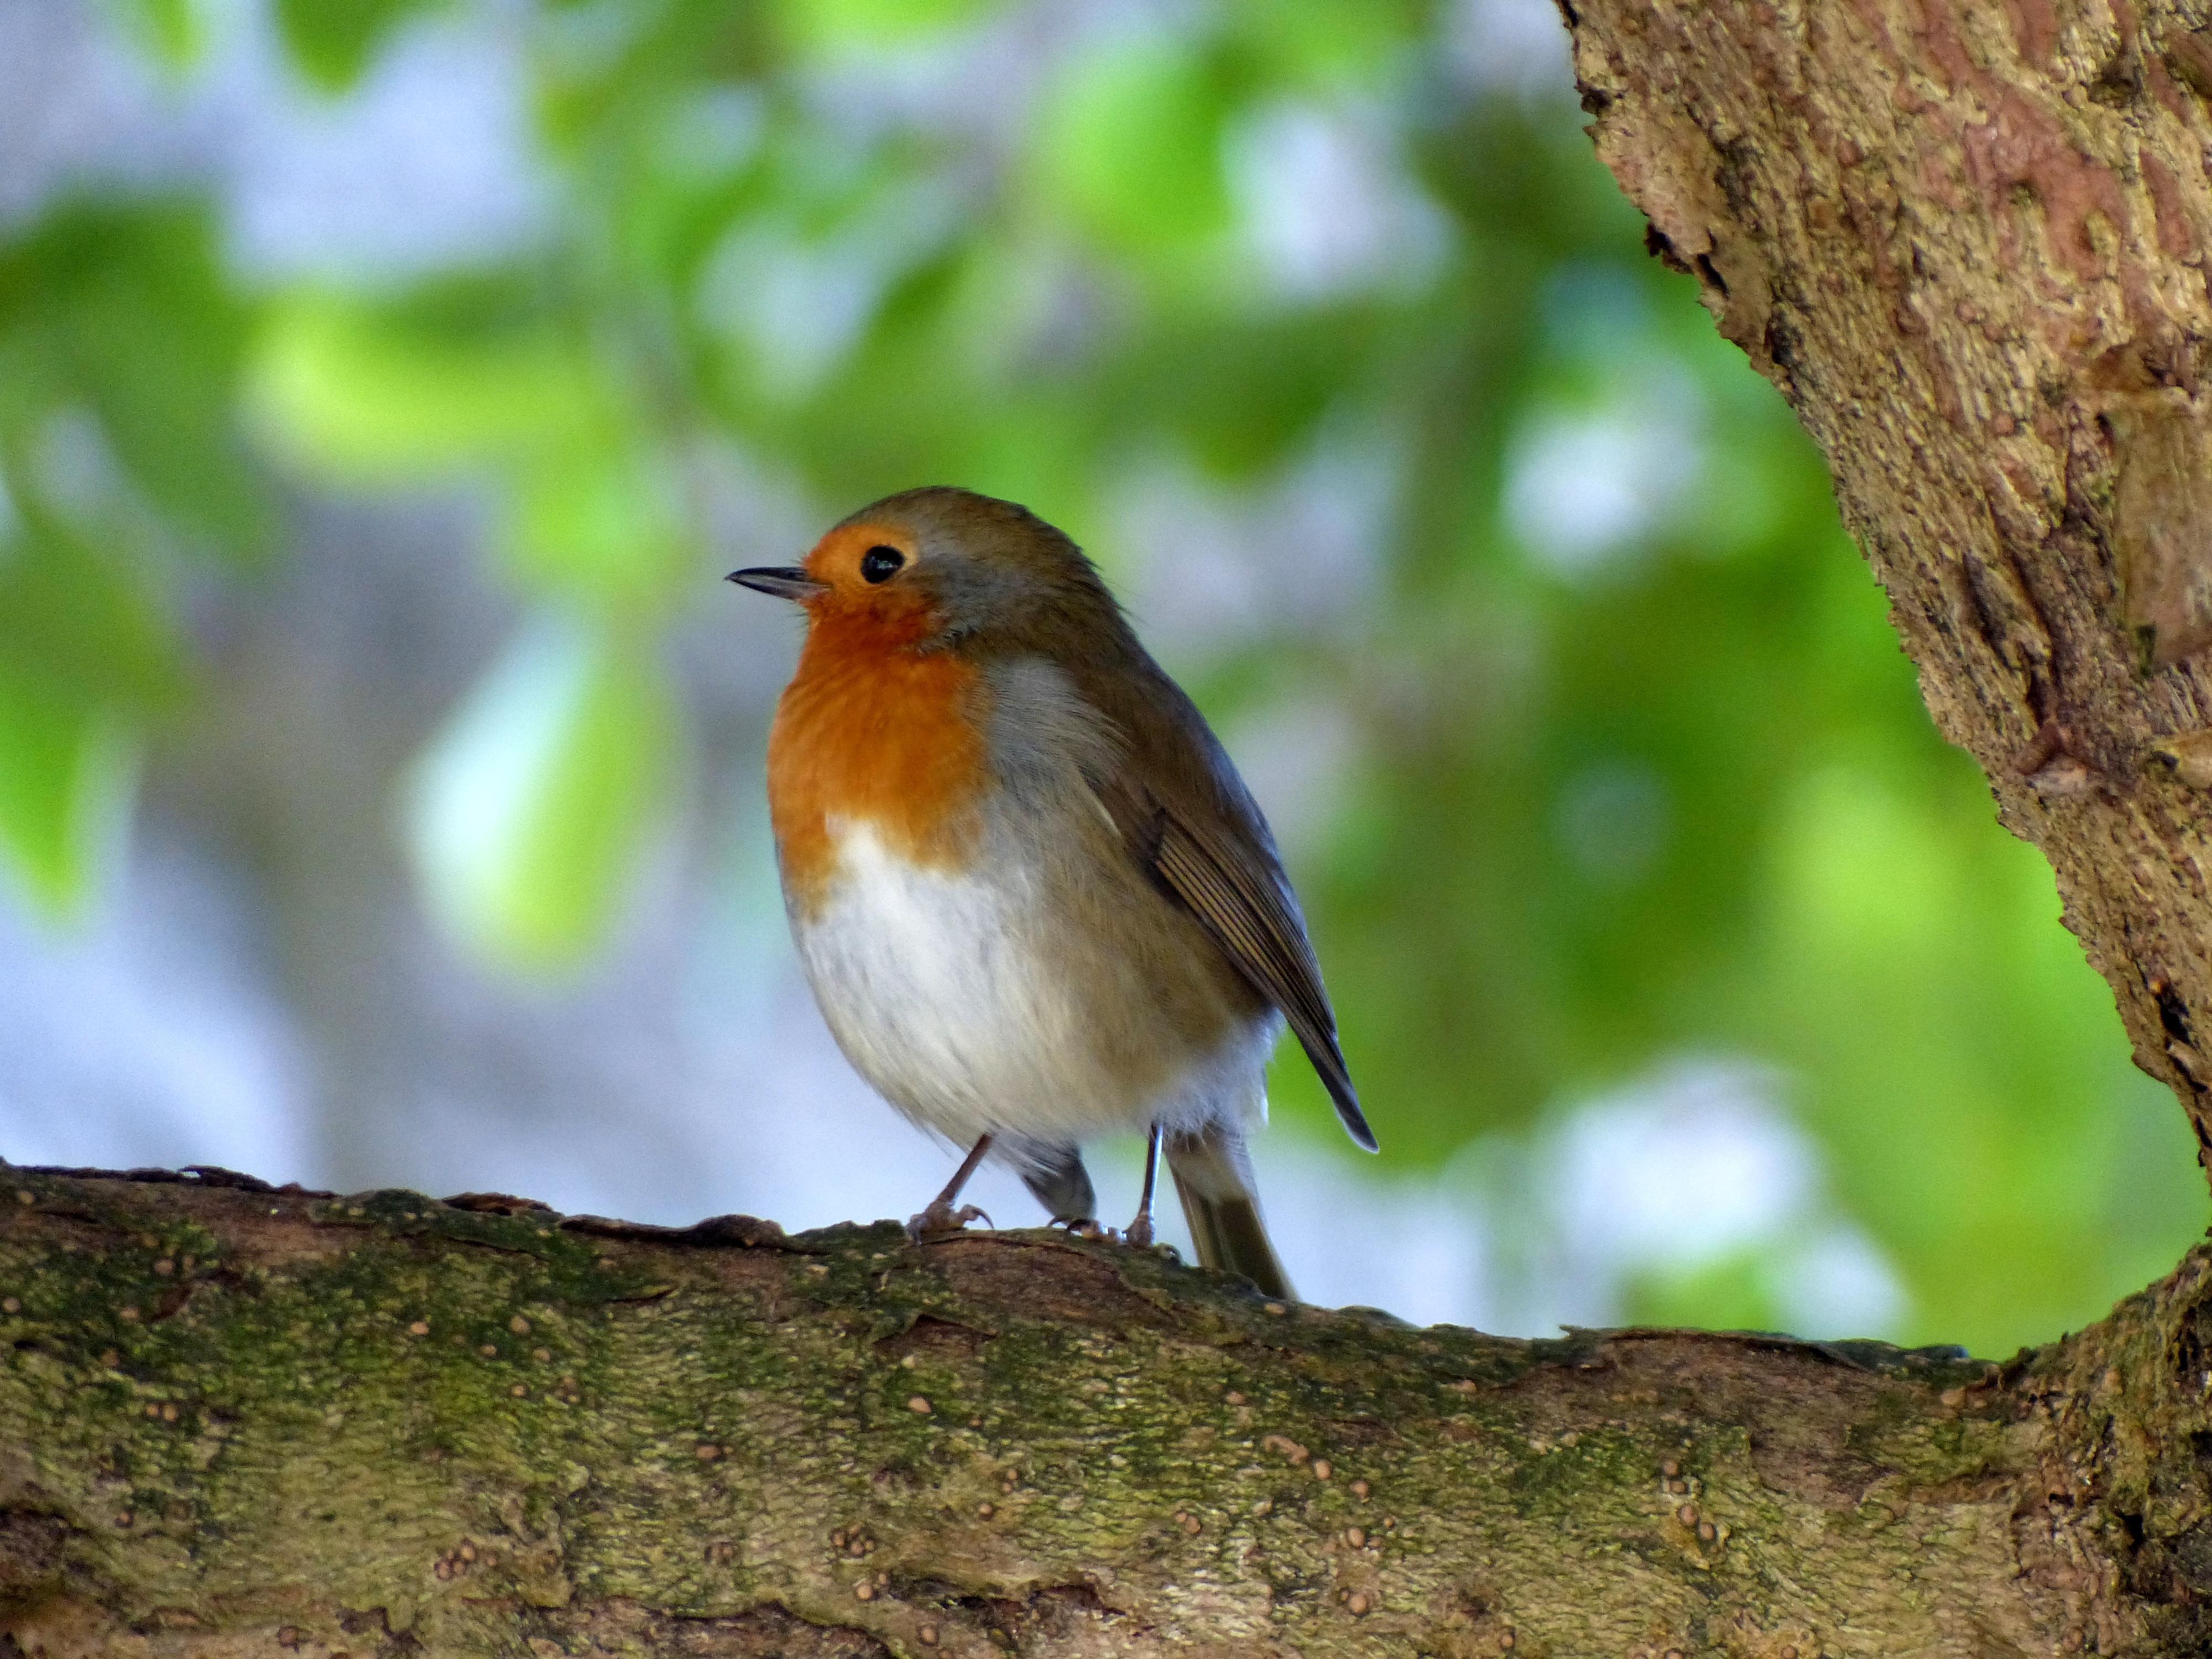 free images robin nature foraging close animals. Black Bedroom Furniture Sets. Home Design Ideas